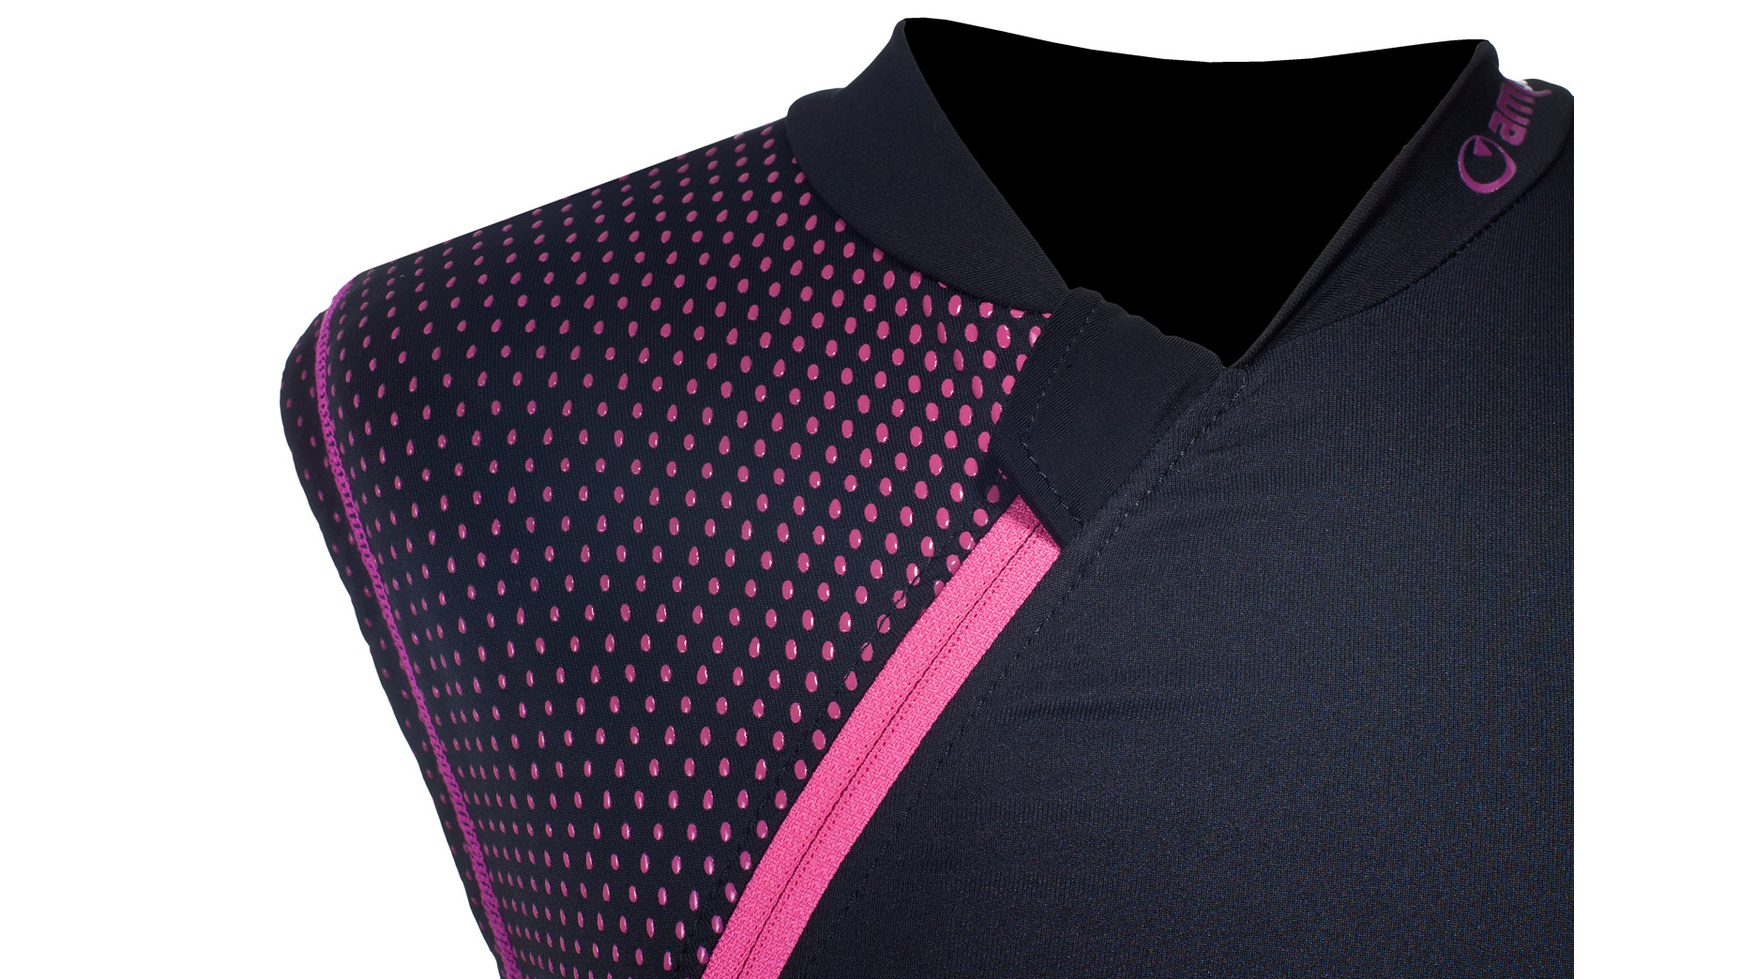 280001001-amplifi_mkii_jacket_woman_detail01